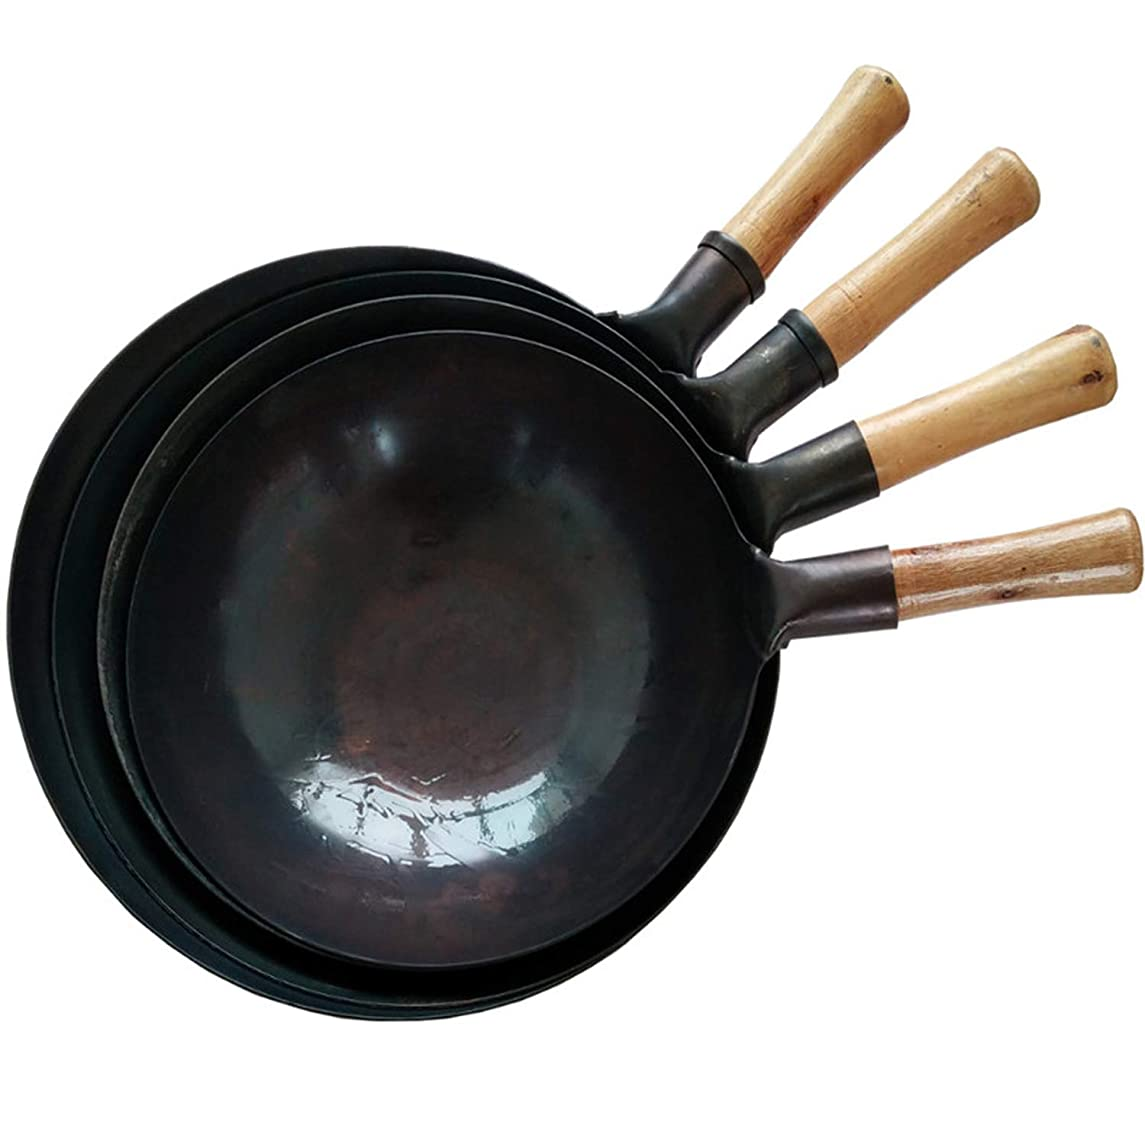 Wooden Handle Kitchen Cooking Pot 32/34/36 Cast Iron Skillet Cooker Universal Wok Restaurant Chef Stir Fry Special Wok Pan,36Cm